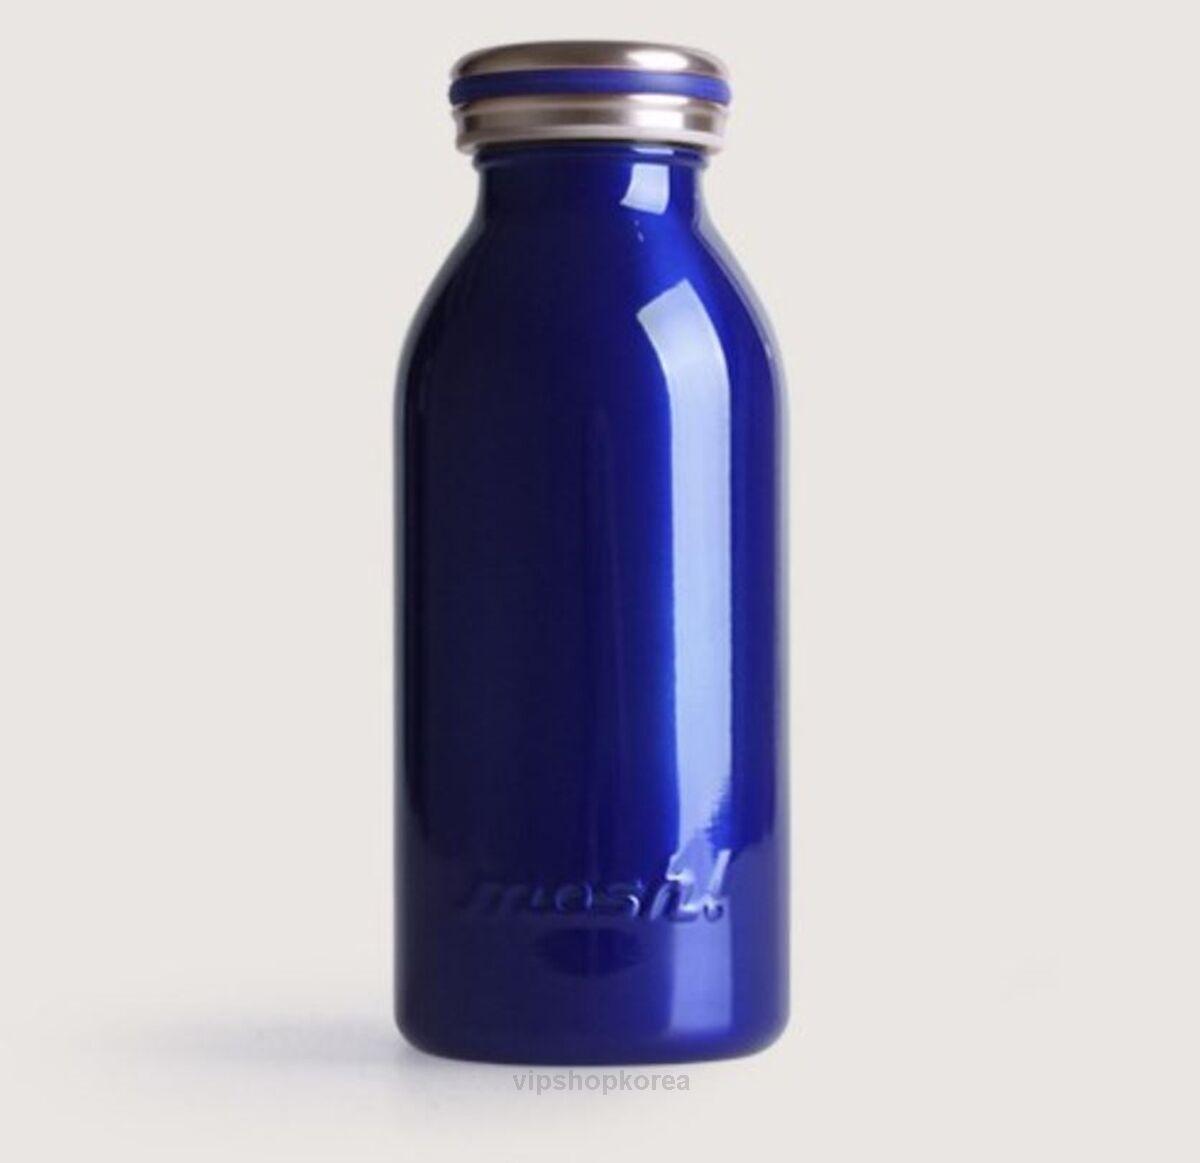 STAINLESS TUMBLER MOSH Deep bluee WATER DEEP blueE Stainless Coffee Tumbler Mosh